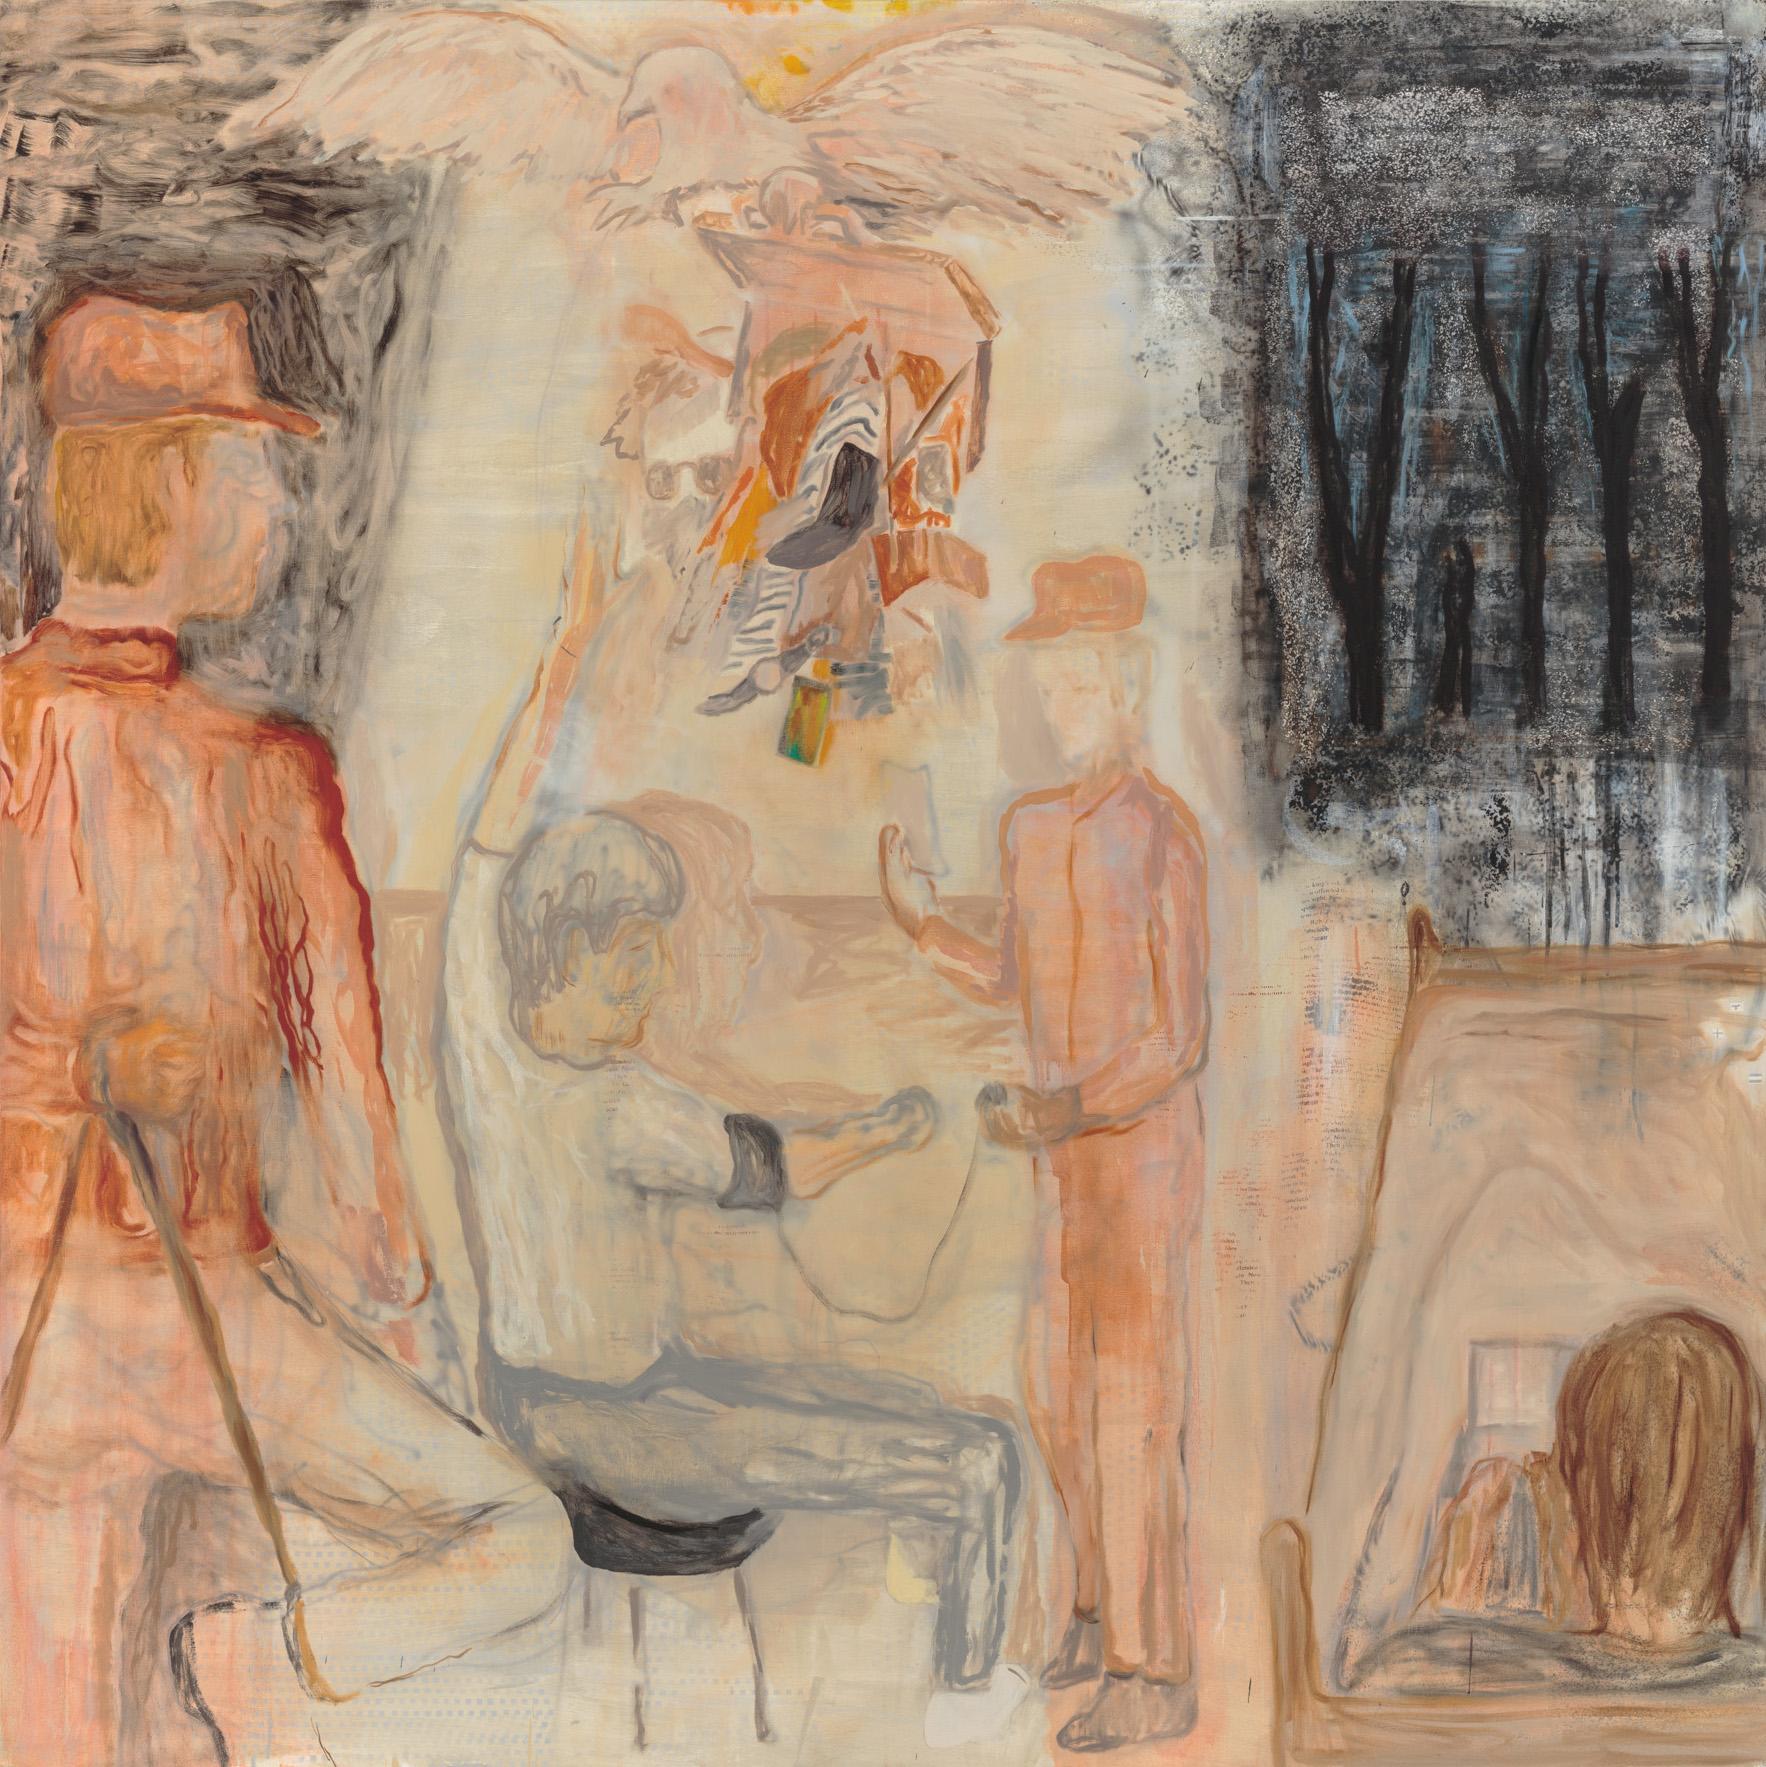 "Interrogation, 72"" x 72"", Oil, Screenprint, Acrylic,  and Airbrush on Canvas, 2017."